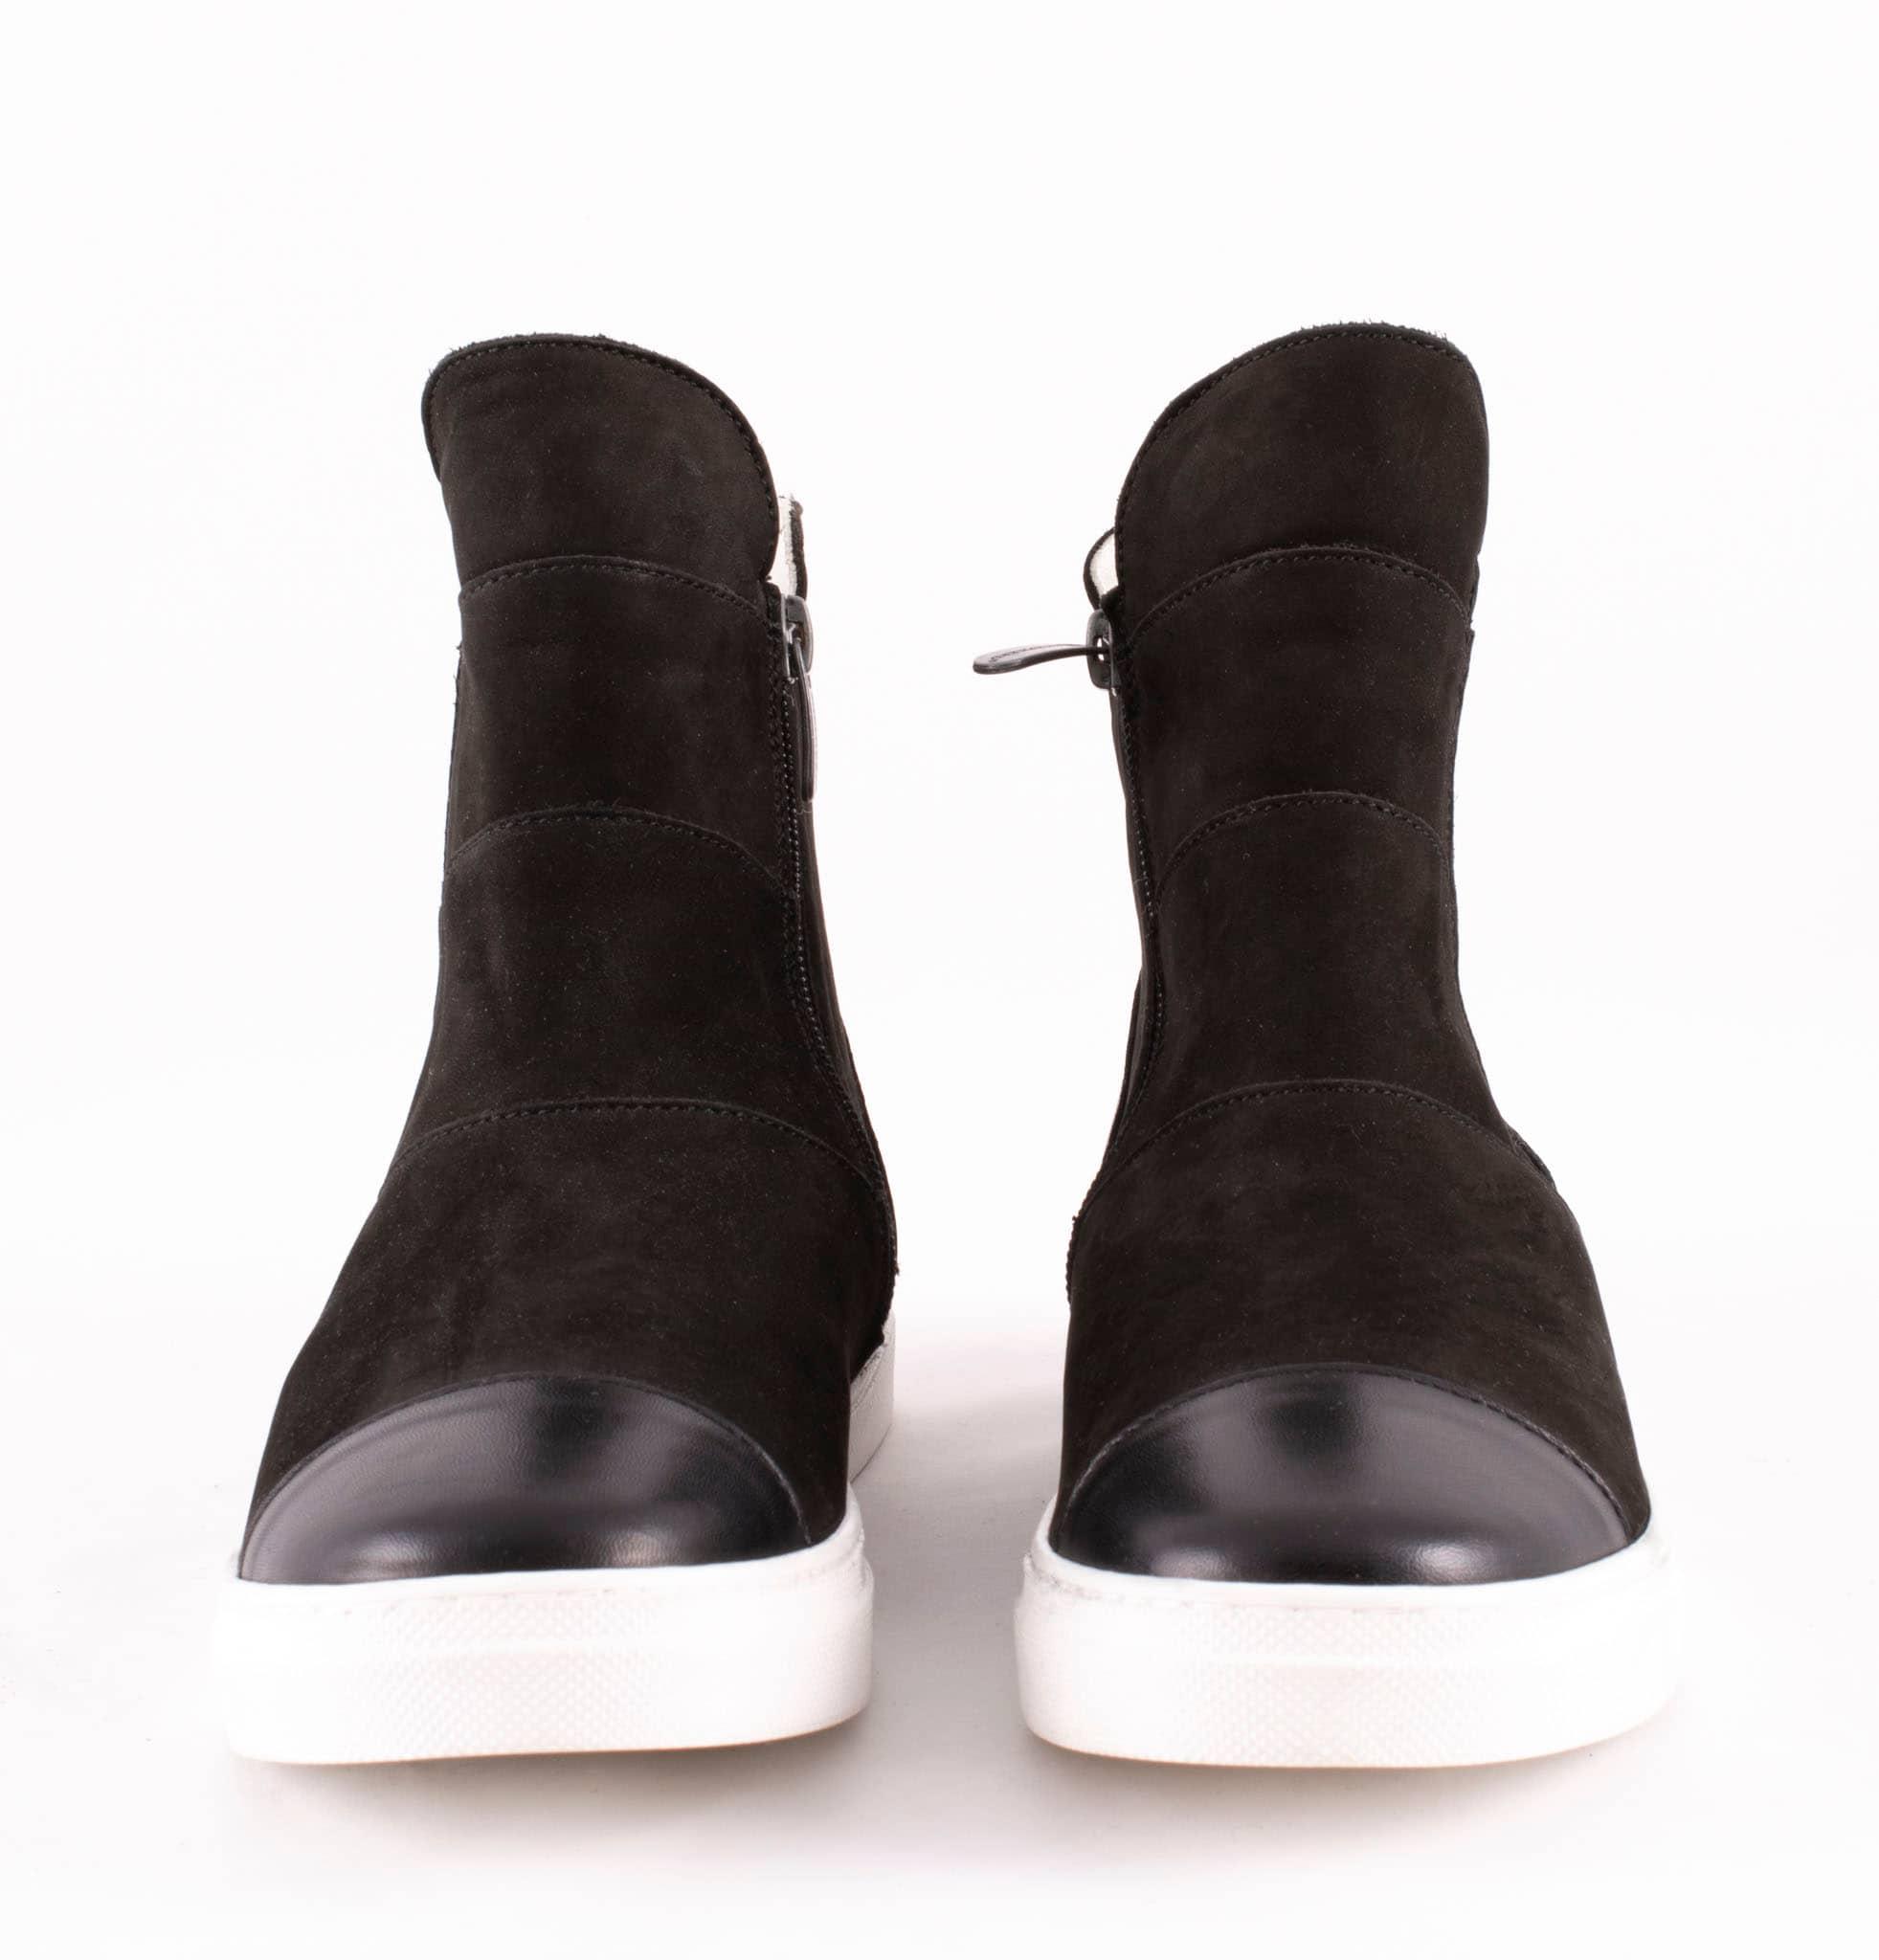 Camilla sneakers